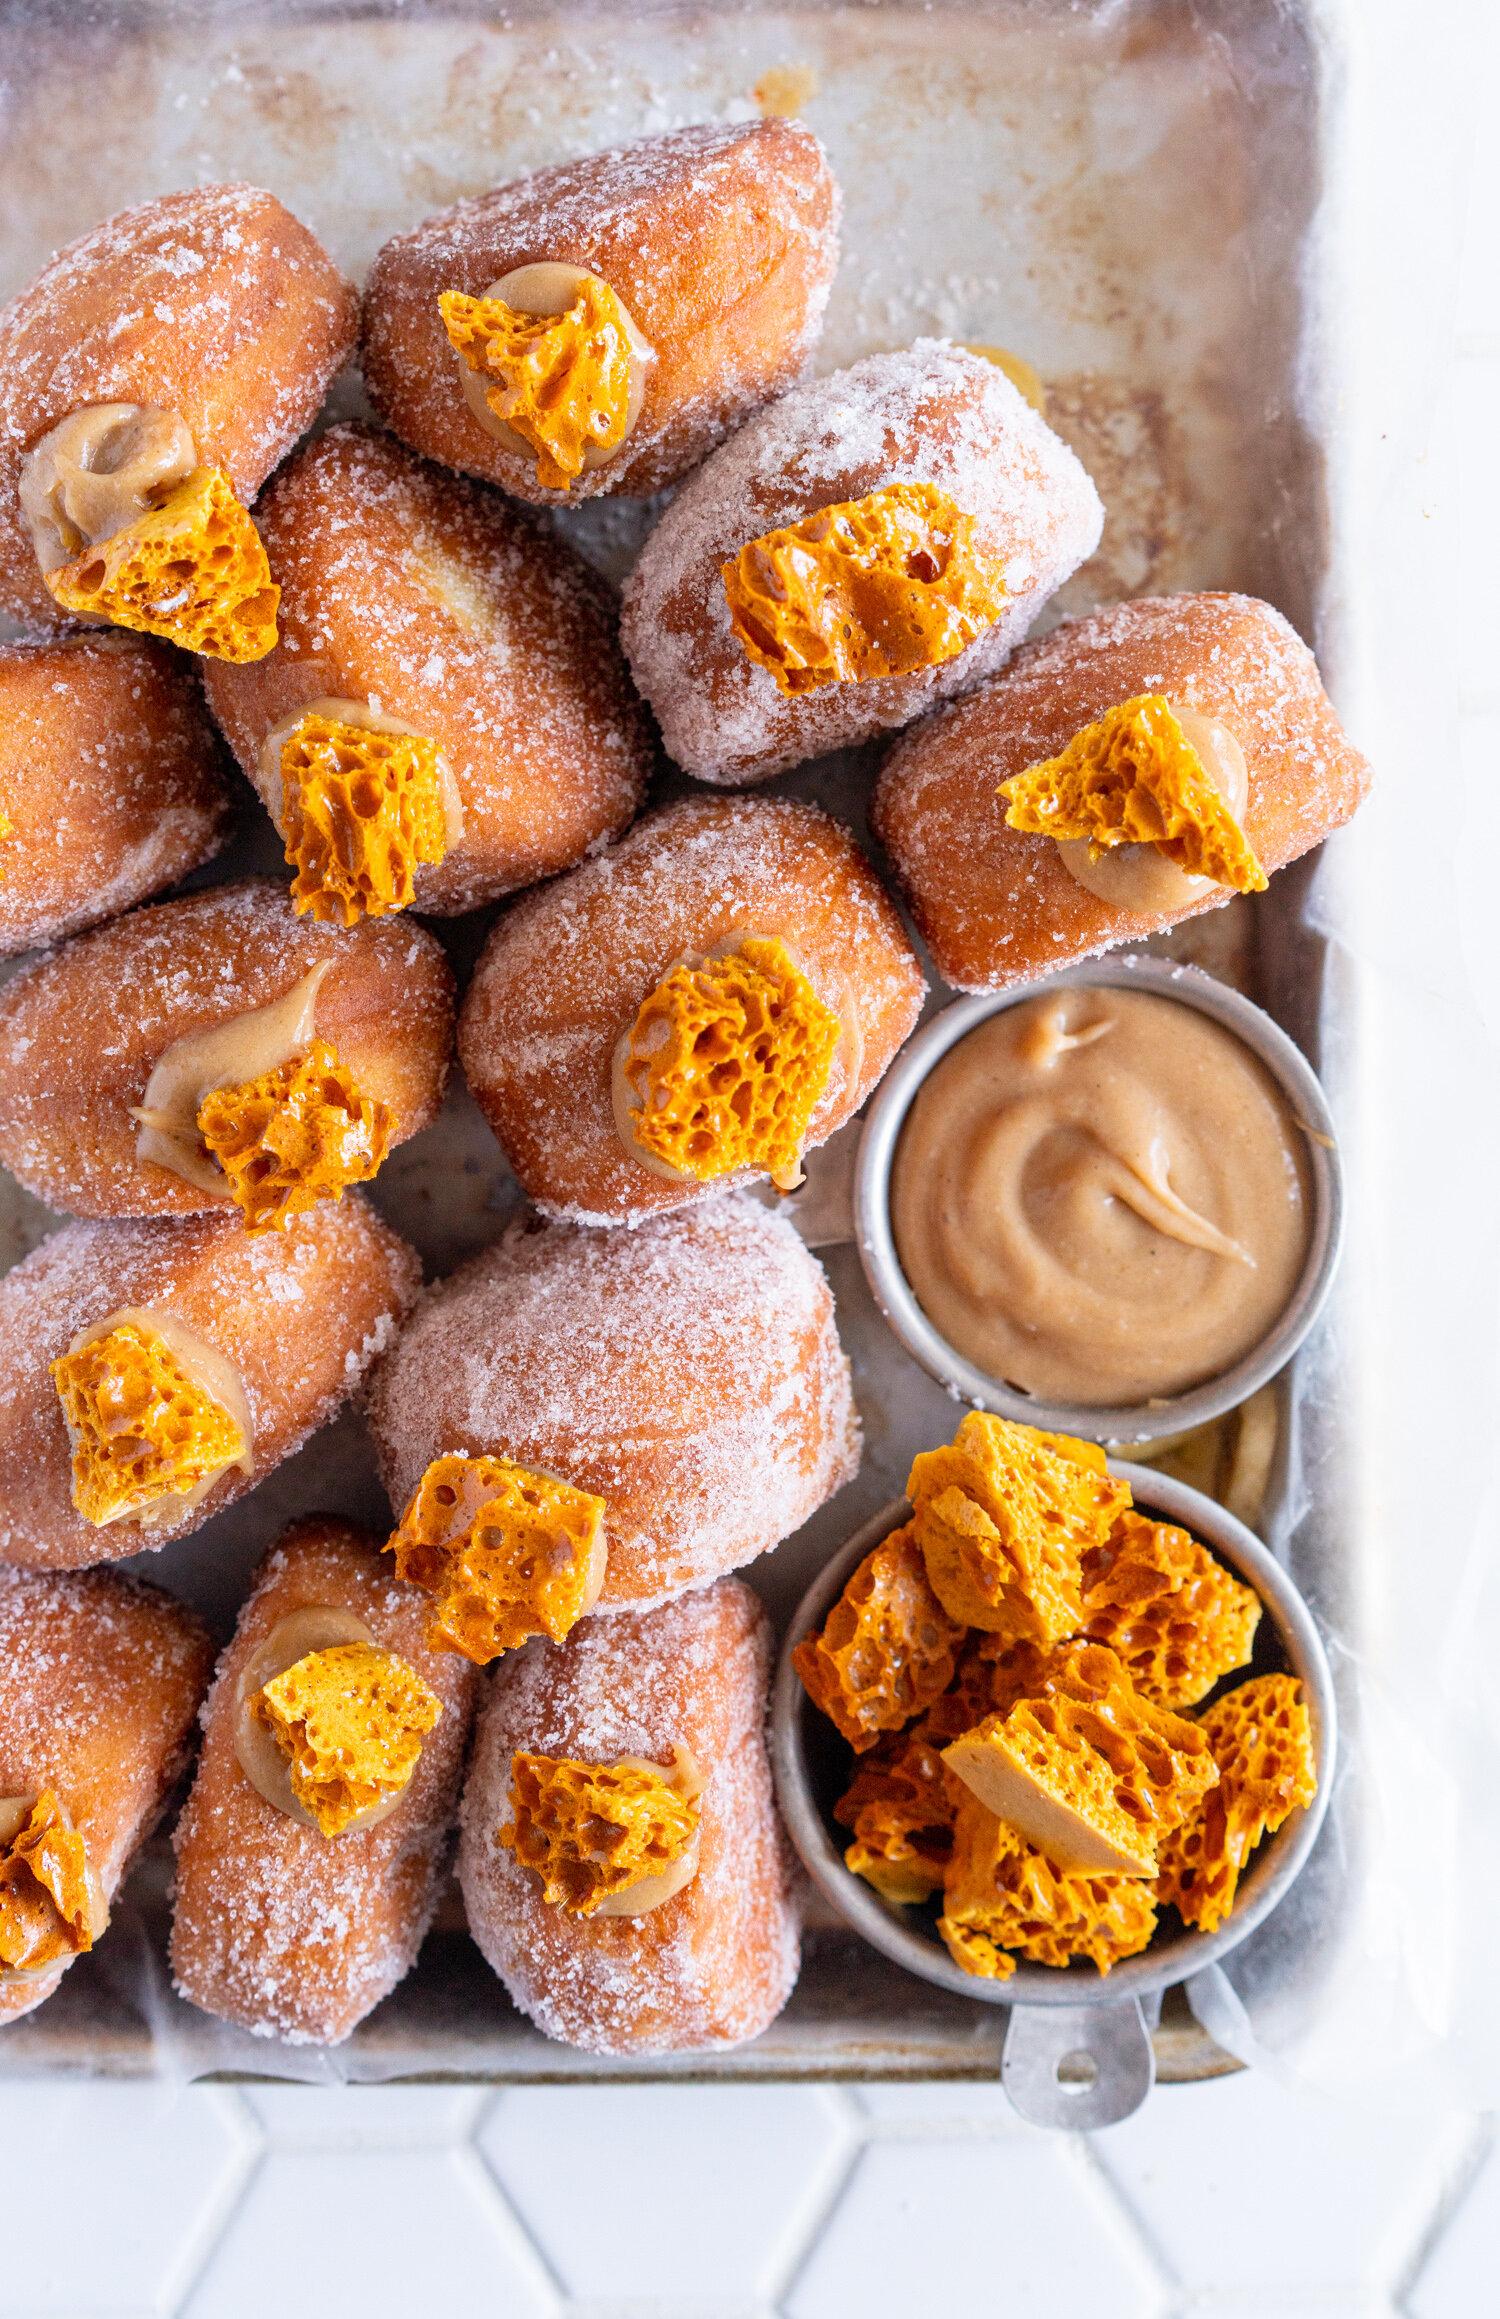 Banoffee Doughnuts - Brioche Doughnuts with Banana Salted Caramel Ganache and Honeycomb #banoffee #doughnuts #briochedoughnuts